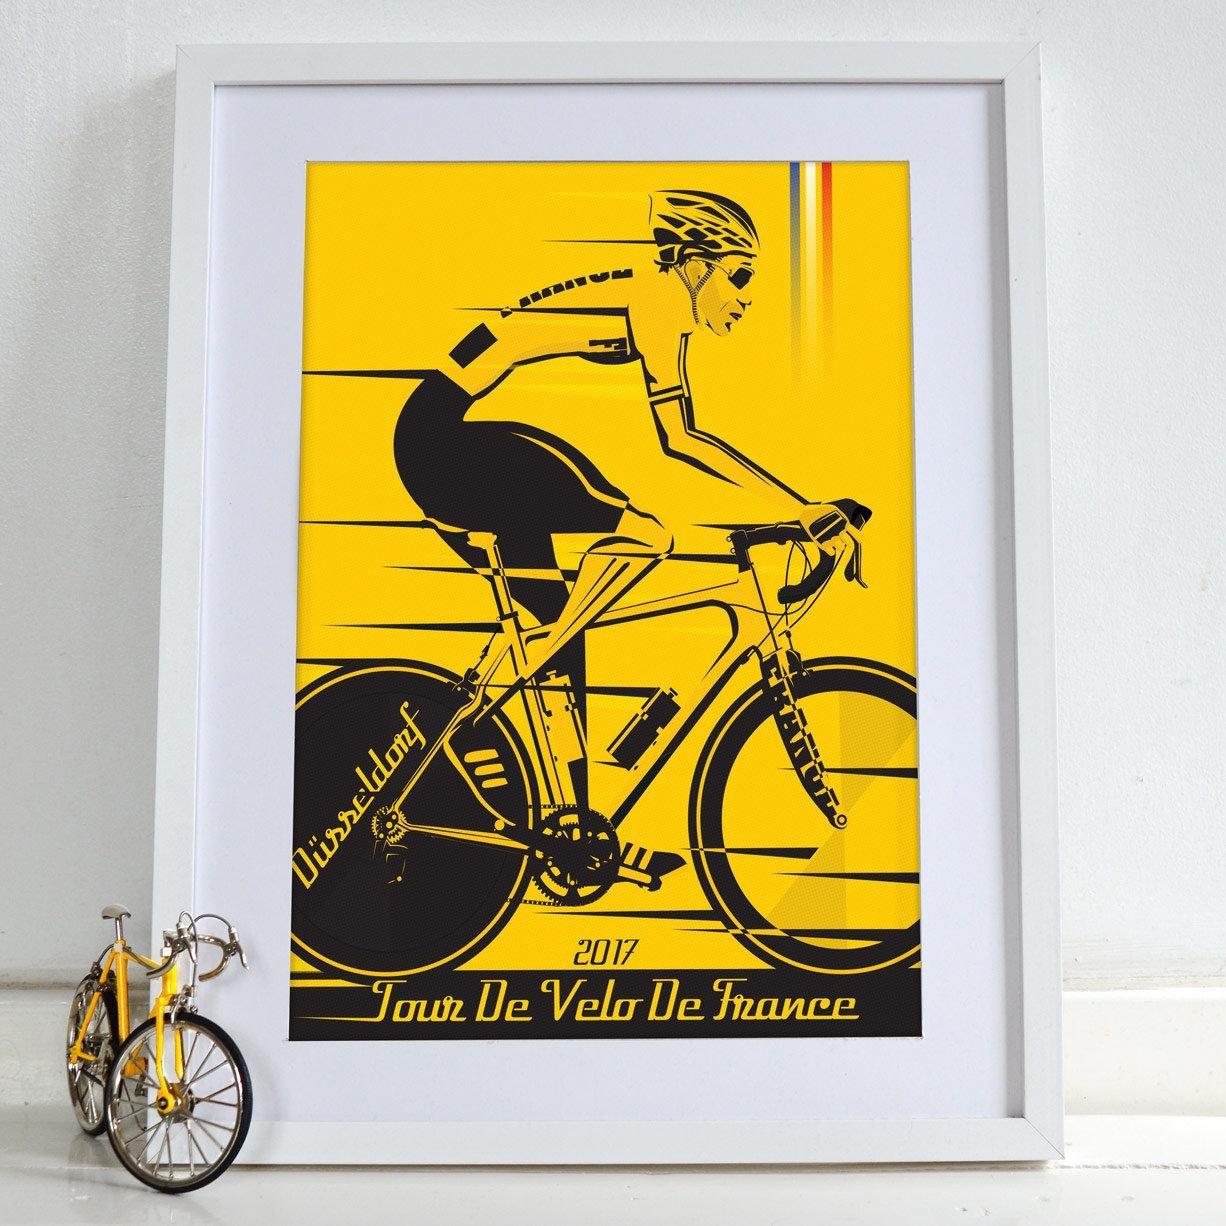 Grand Depart Düsseldorf Tour De France 2017 Bicycle Bike Throughout Cycling Wall Art (Image 9 of 20)